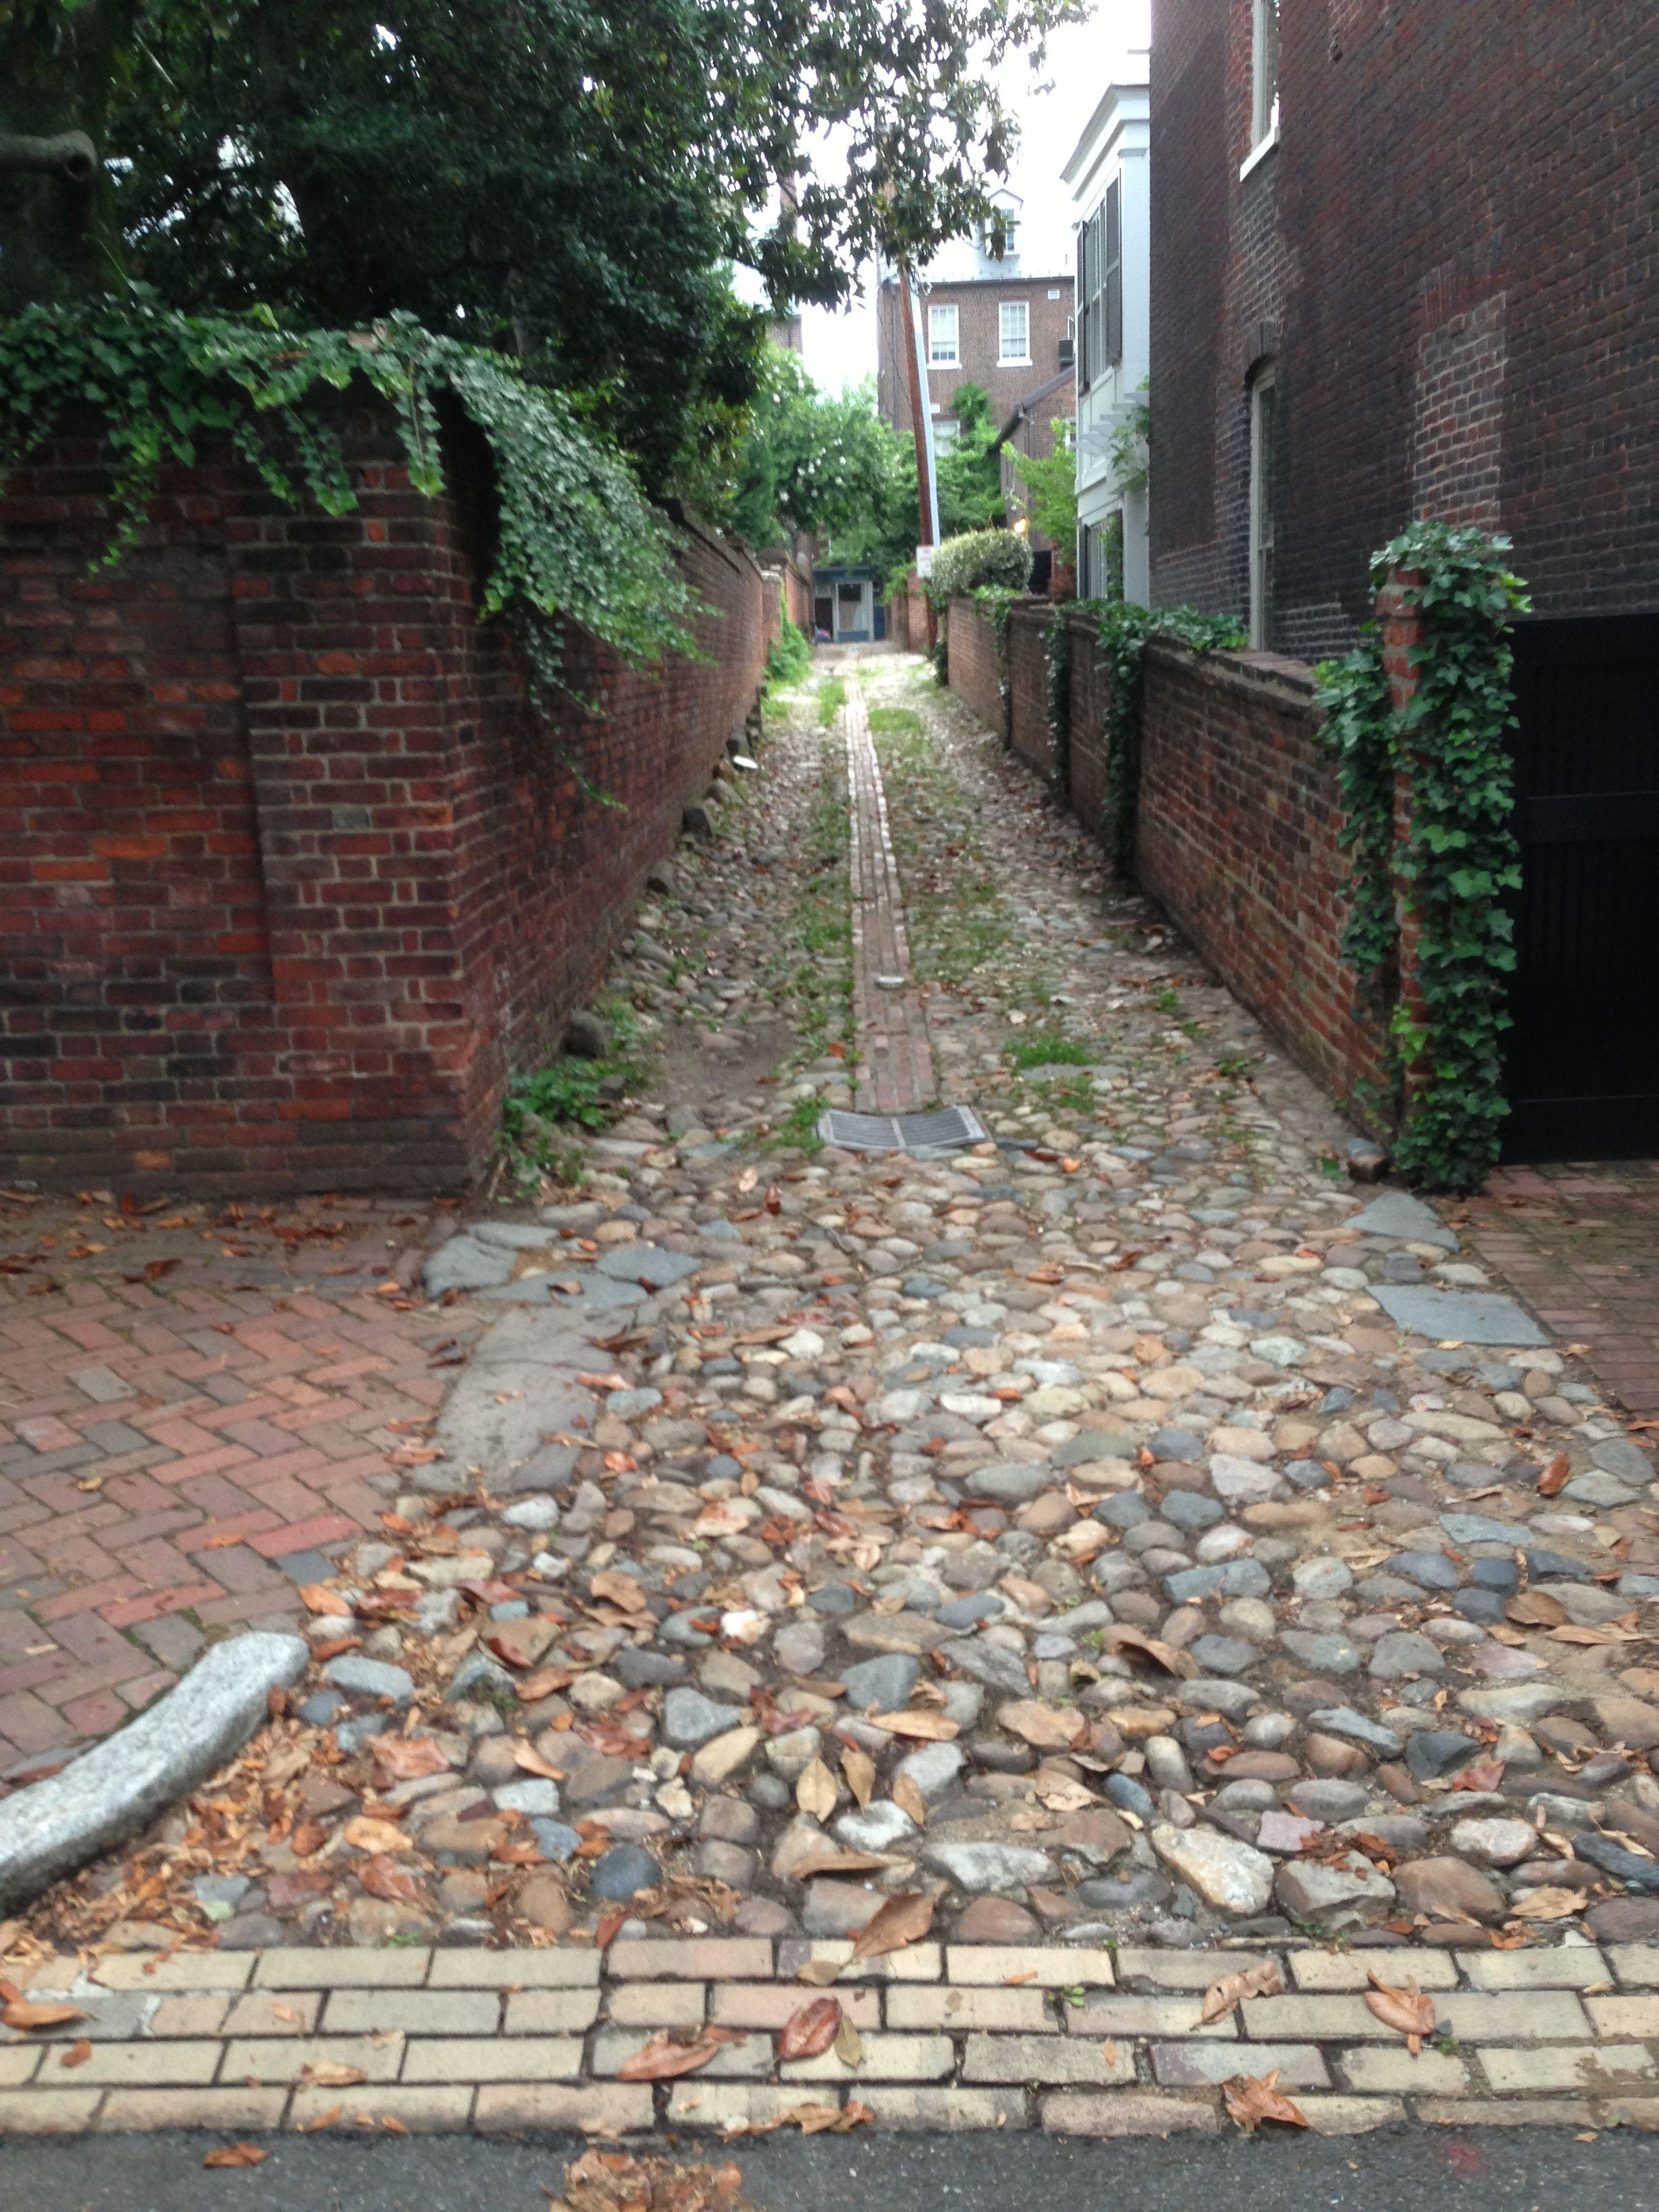 Cobble Stone Alley - Town Alexandria Va